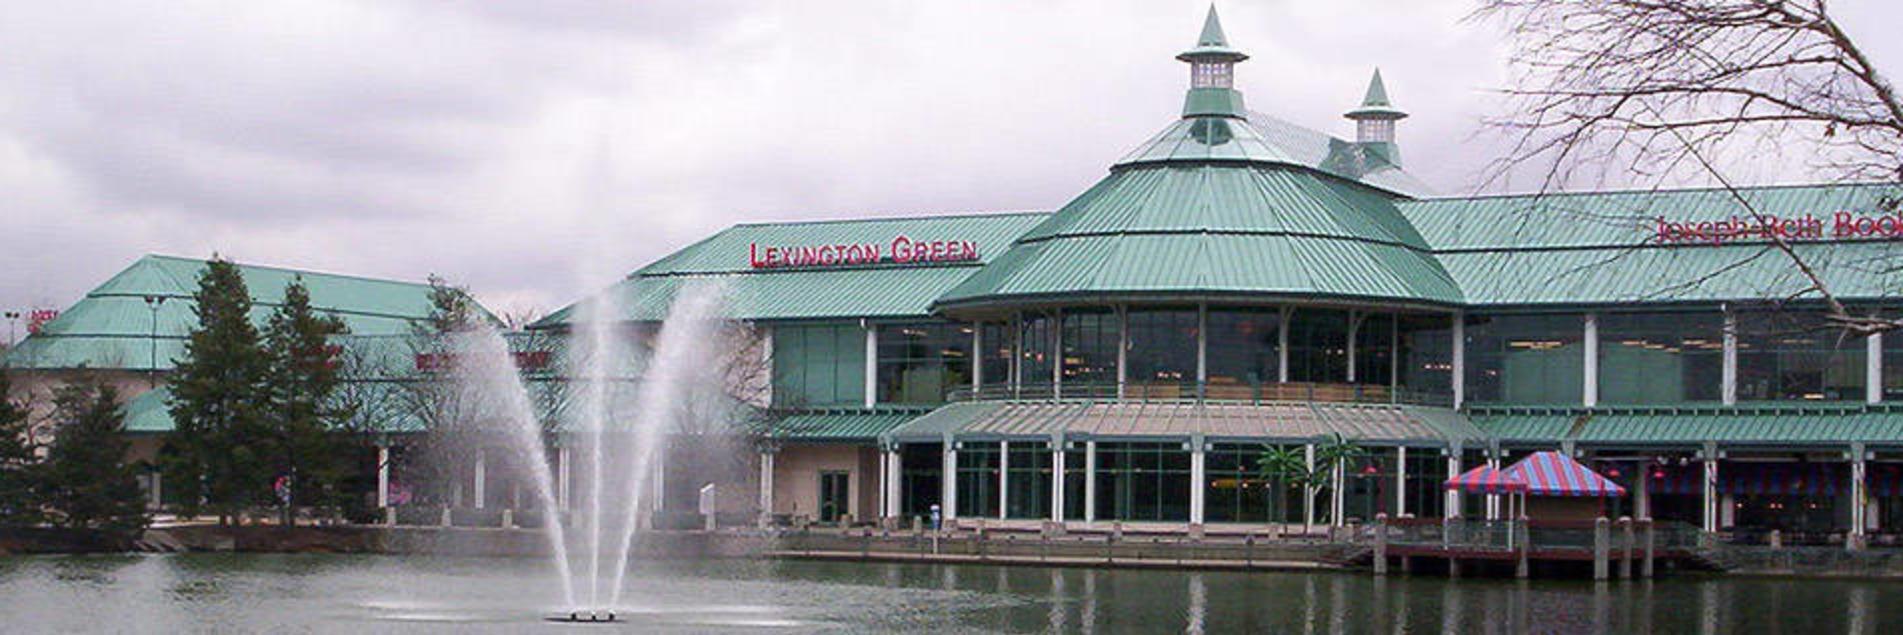 Lexington Green Mall